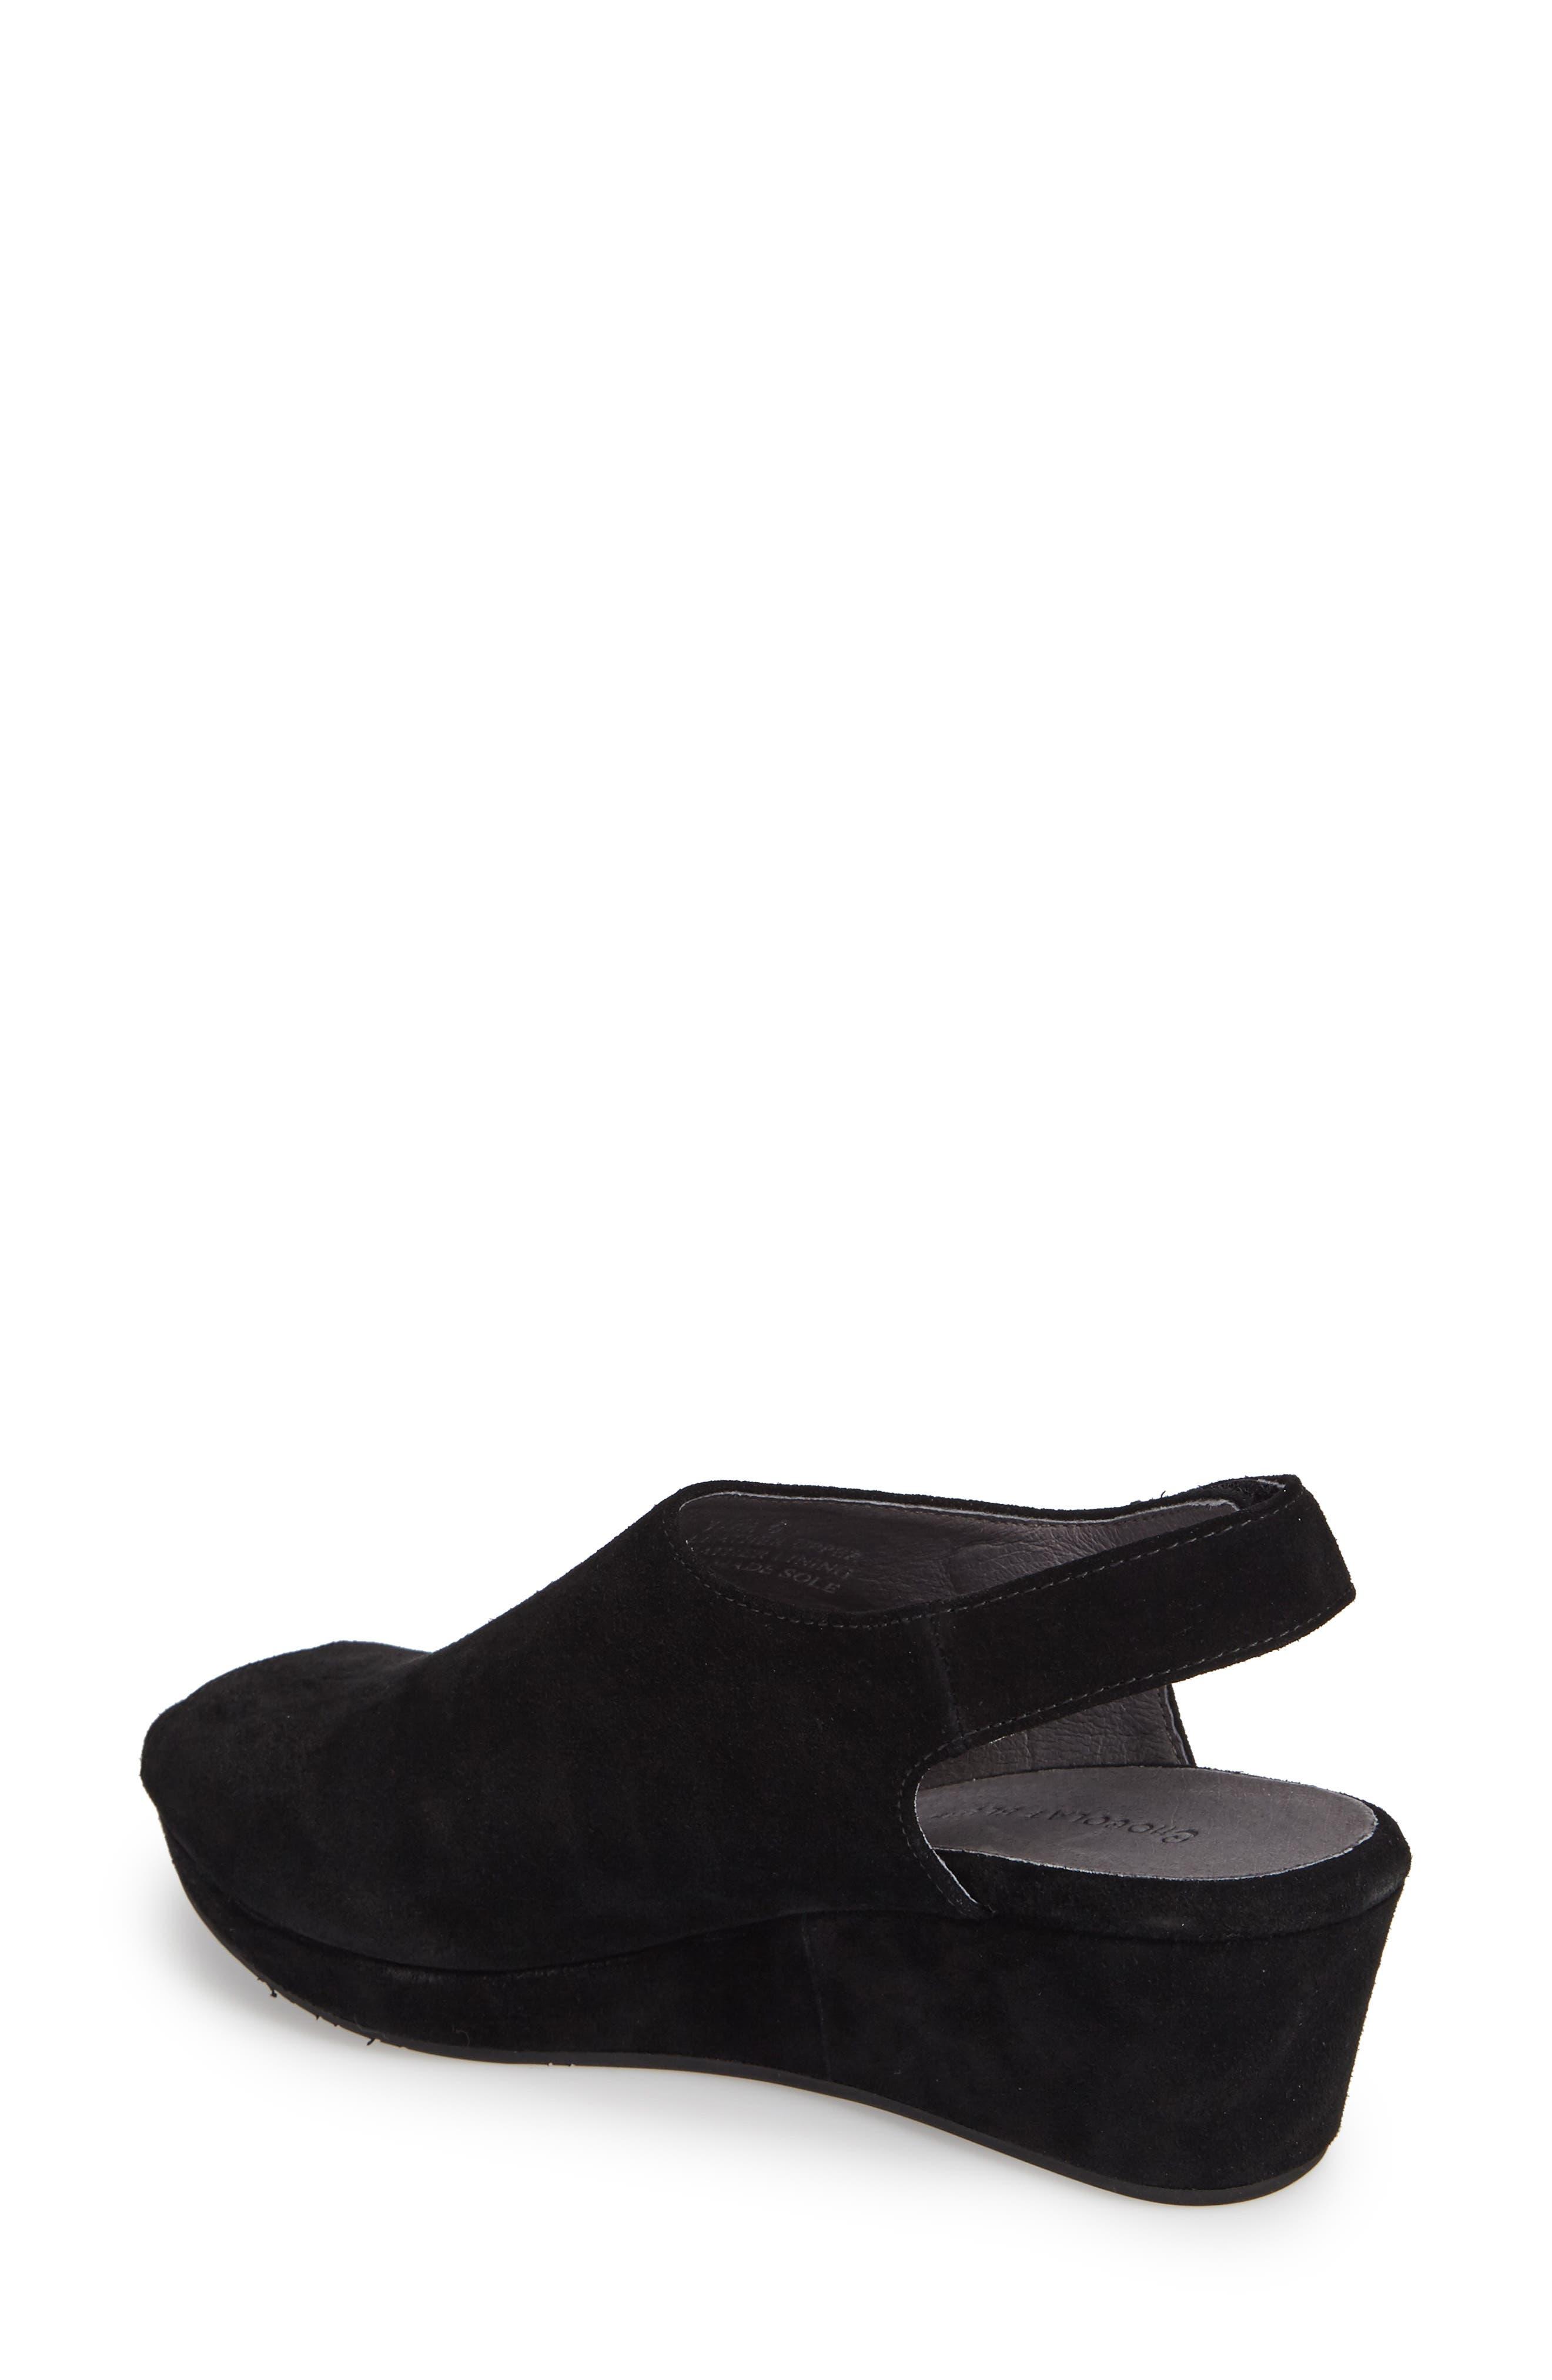 Yana Wedge Sandal,                             Alternate thumbnail 2, color,                             BLACK SUEDE